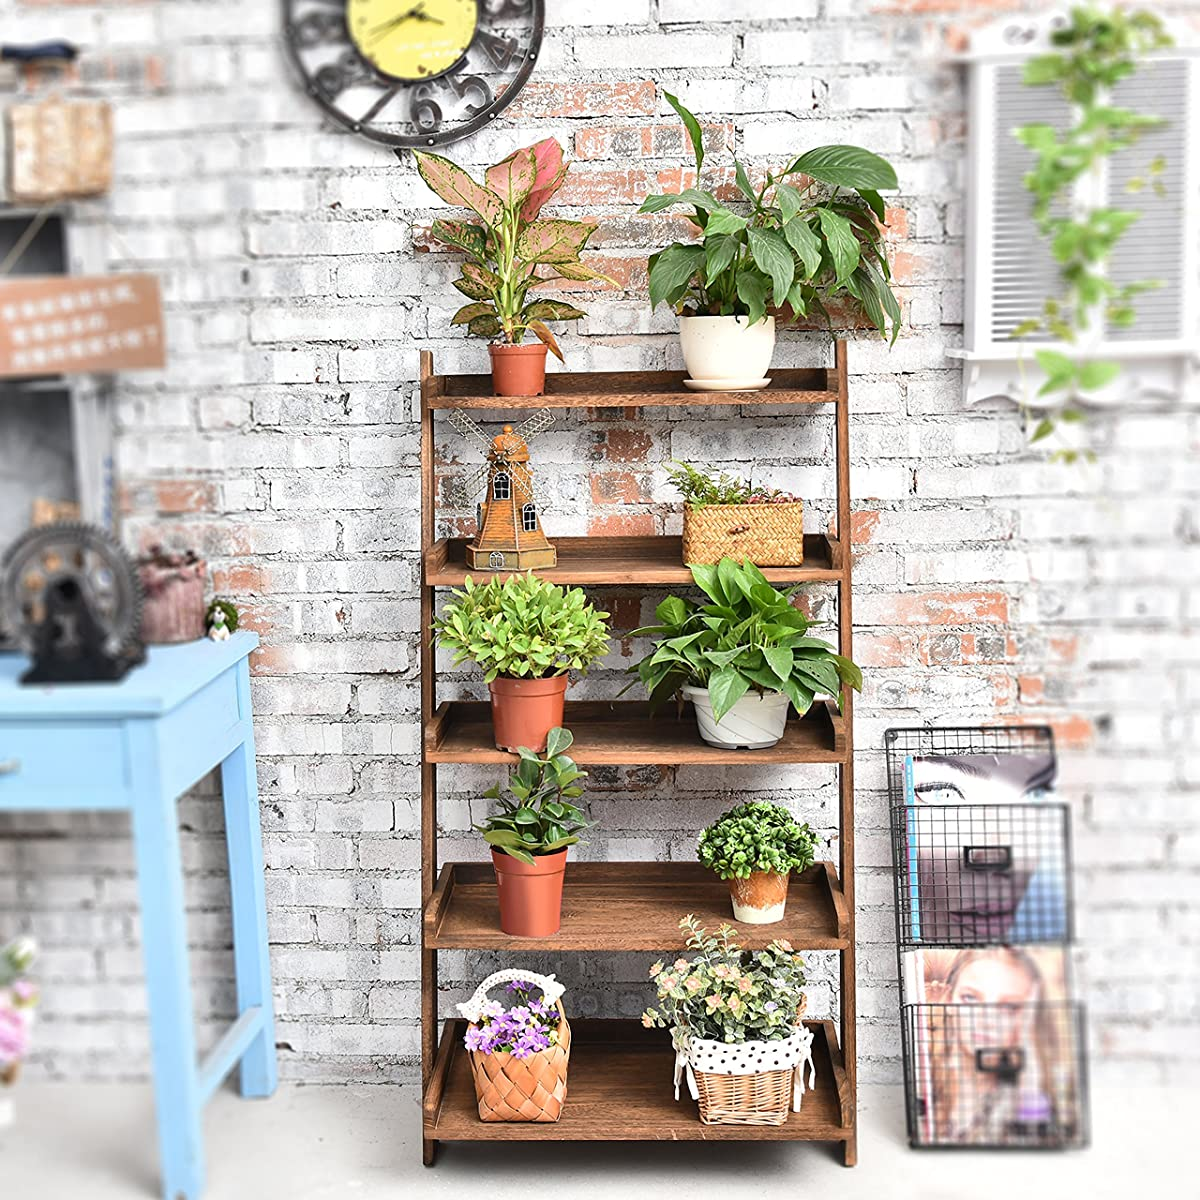 5 Tier Country Rustic Wood Display Shelf, Leaning Wall Organizer Rack, Dark Brown